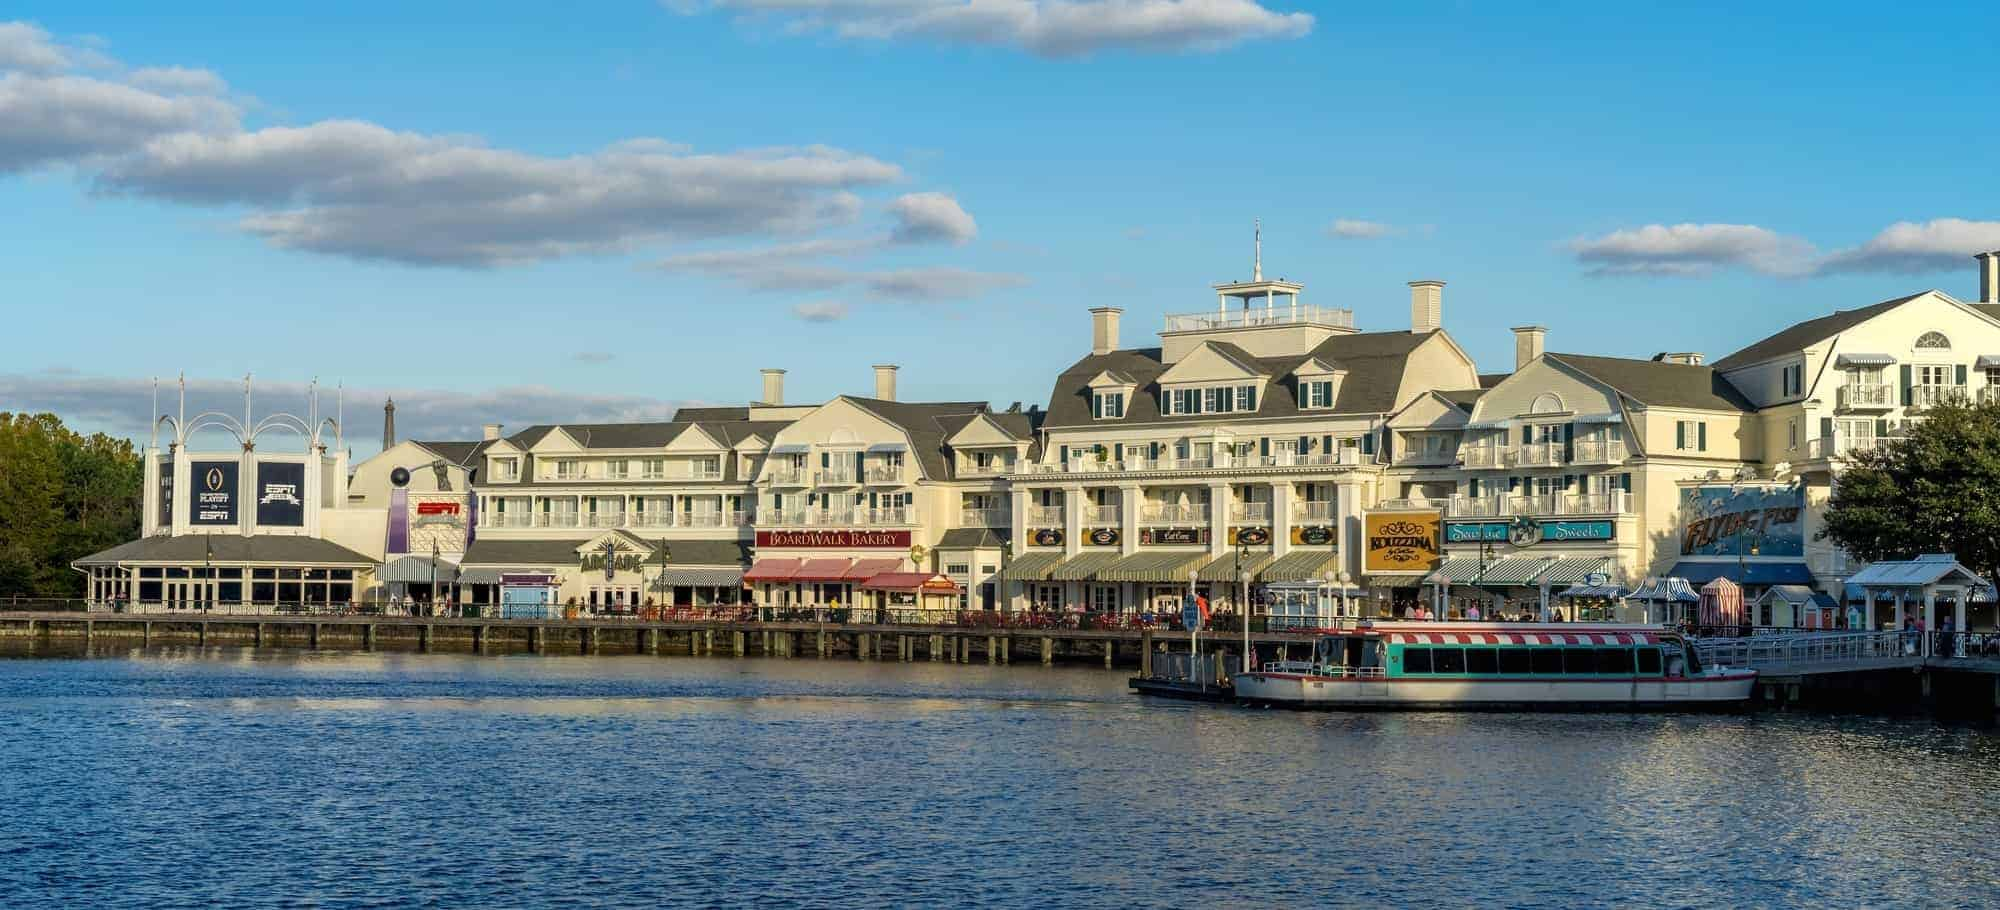 Boardwalk Hotel. Epcot Disney Florida